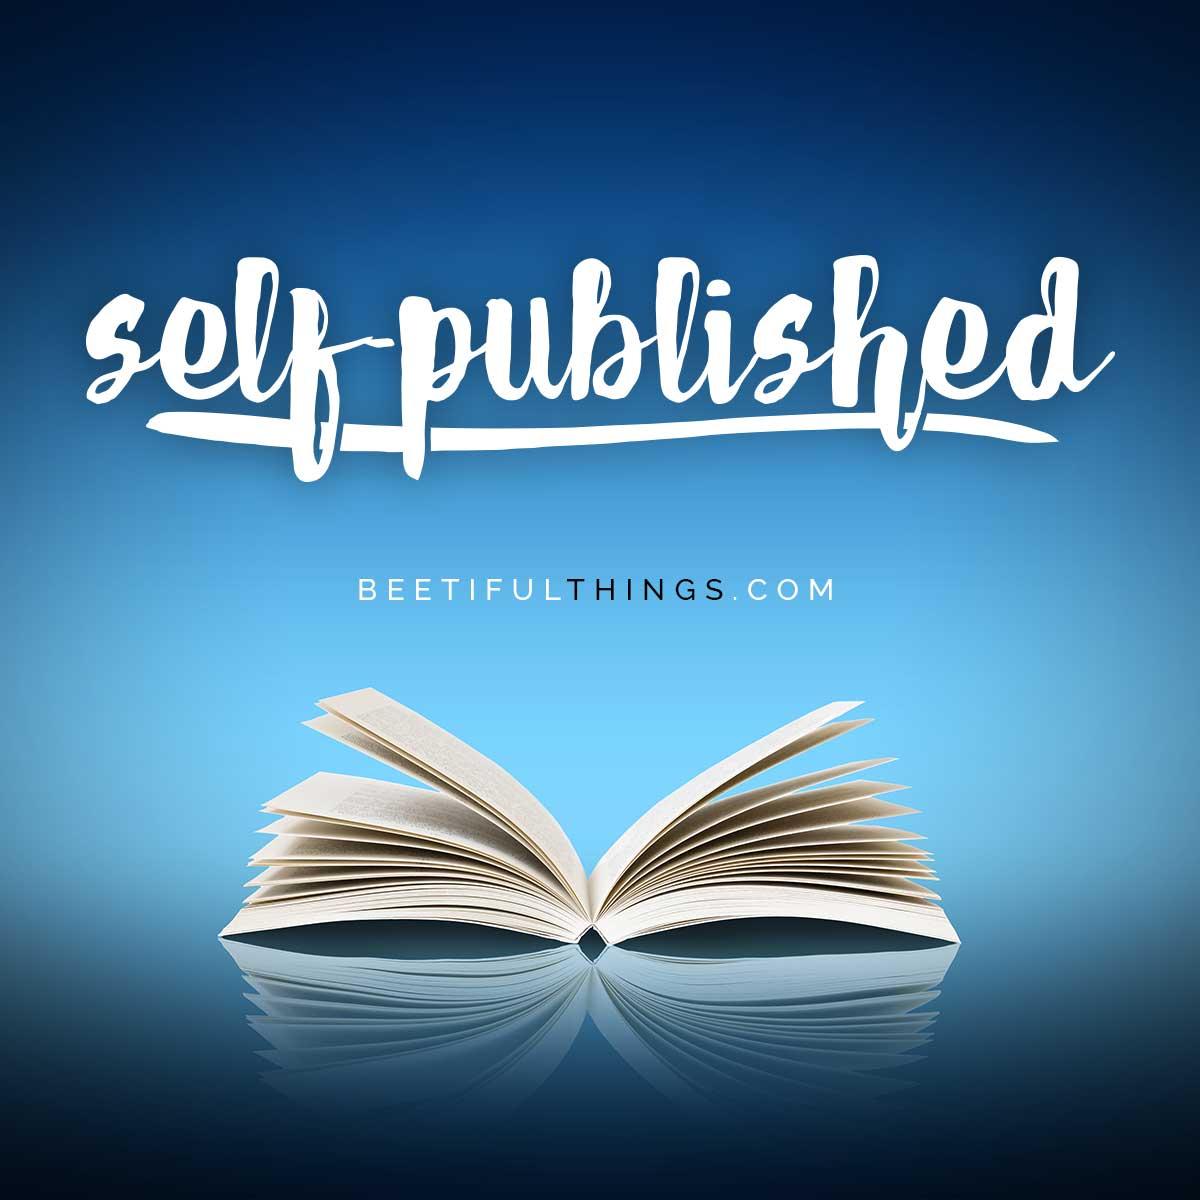 Self-Published